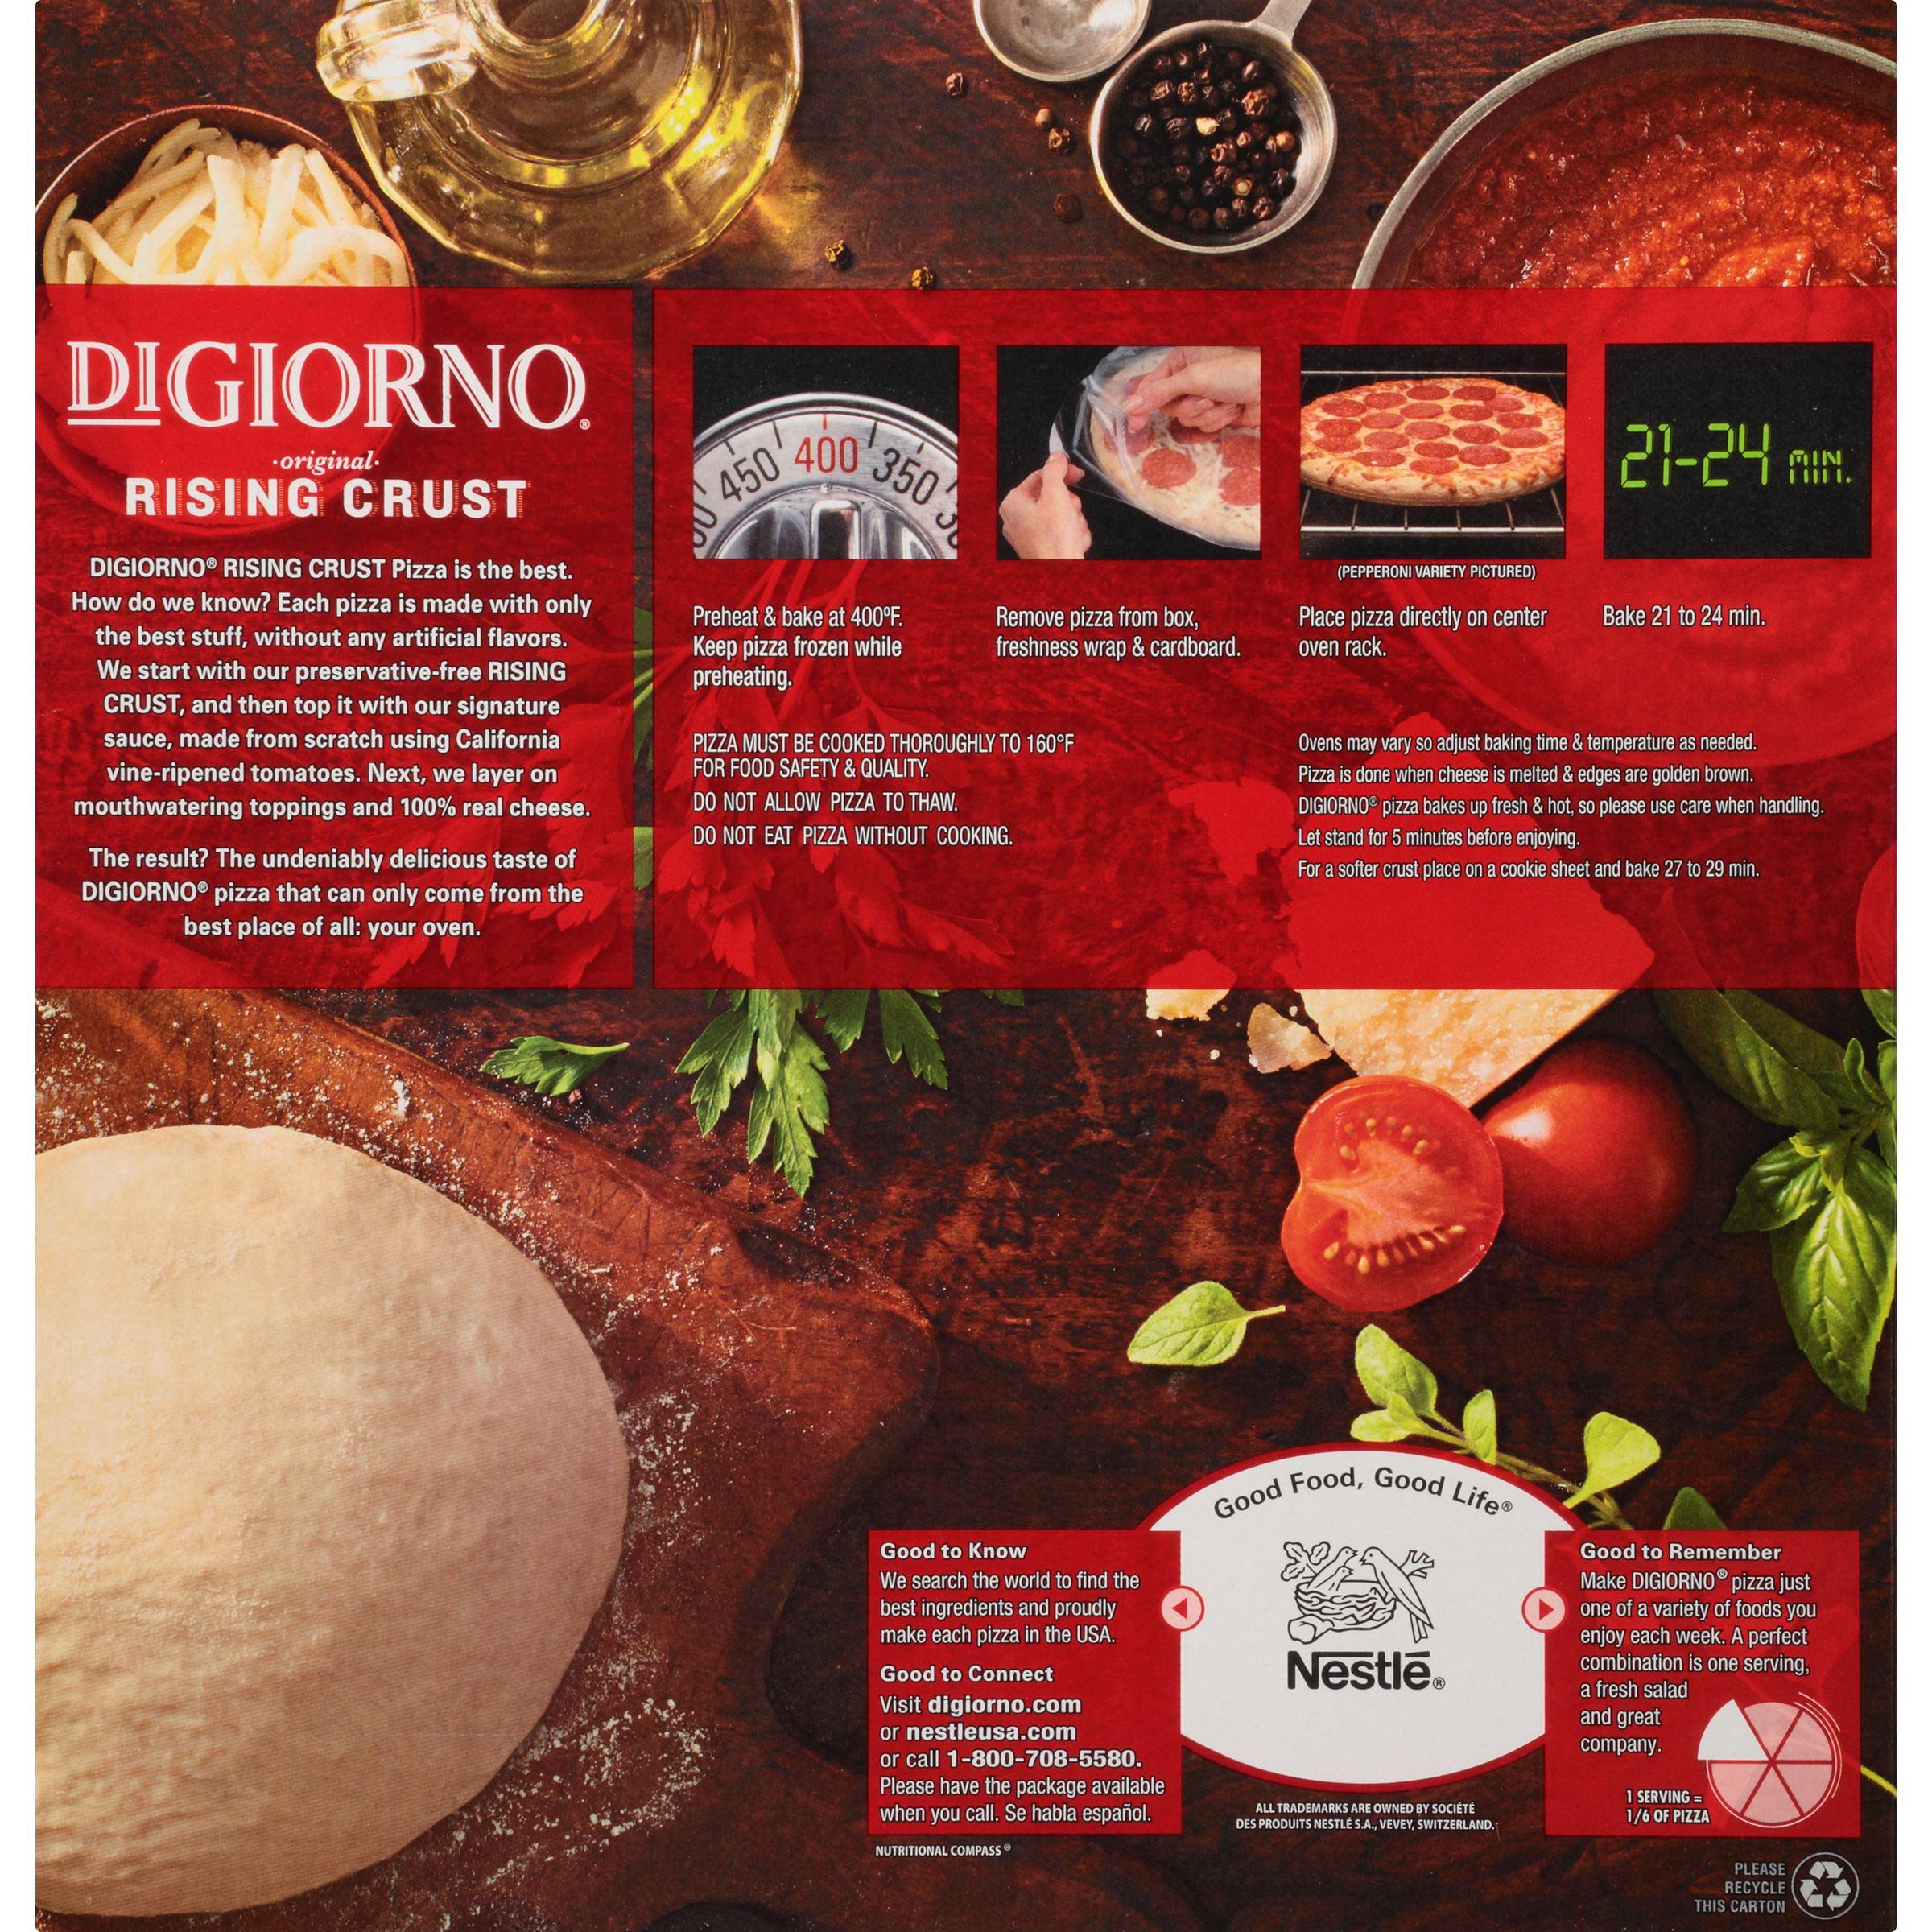 How To Cook A Pizza Digiorno Rising Crust Sausage Pepperoni Pizza 303 Oz Box